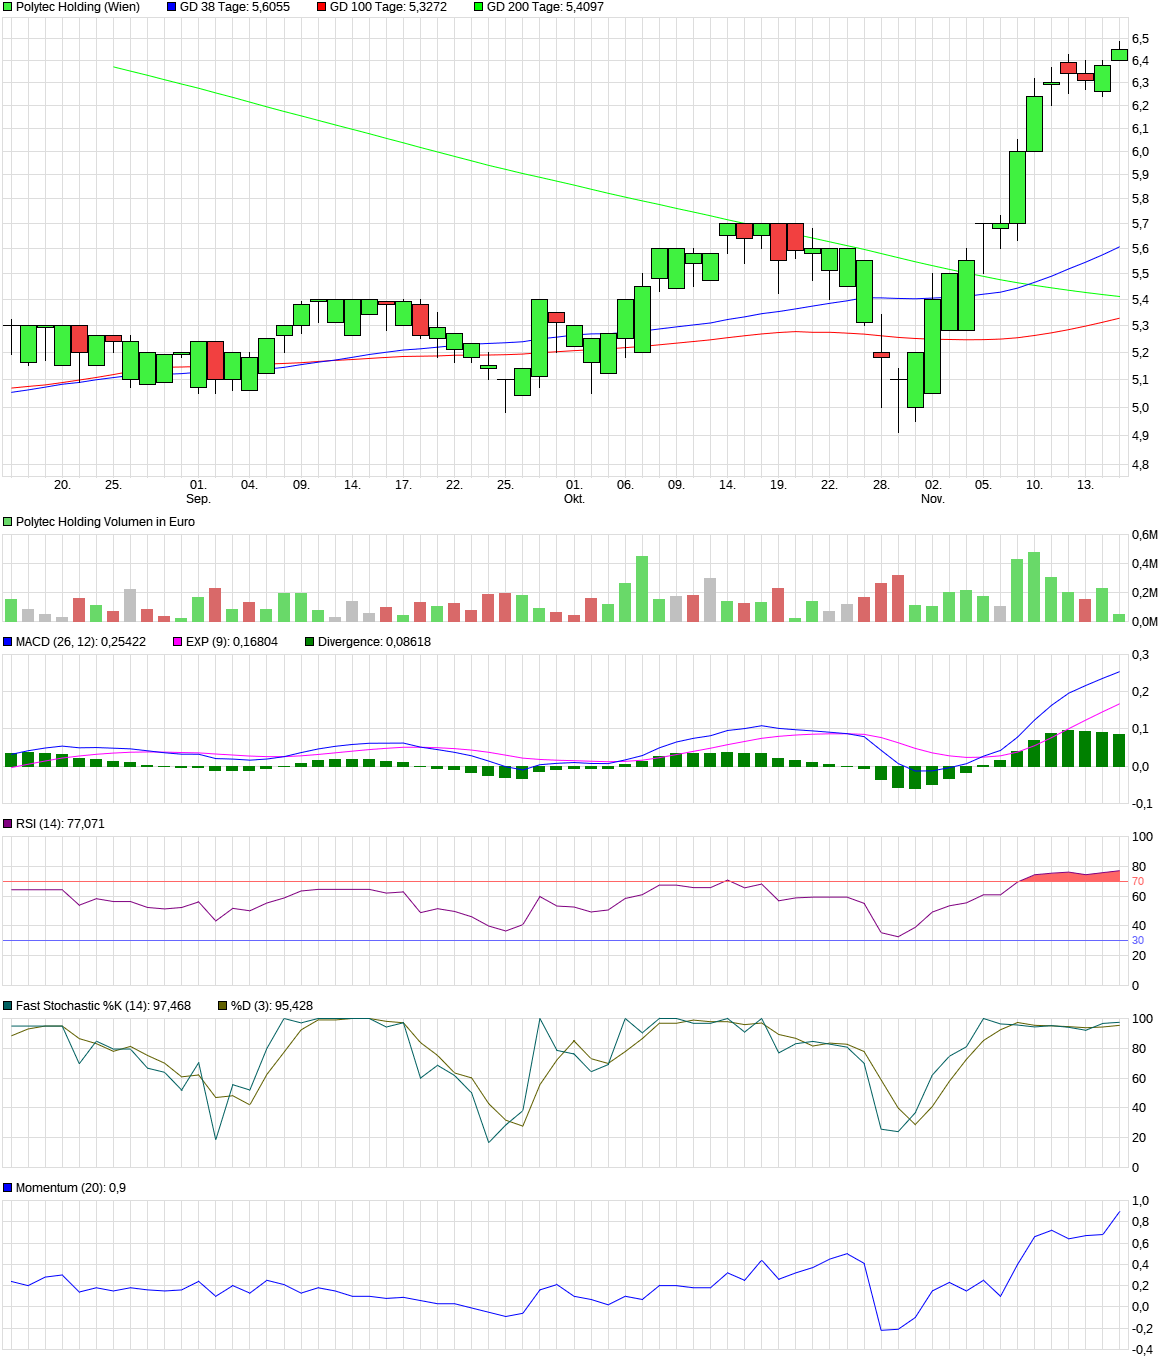 chart_quarter_polytecholding.png